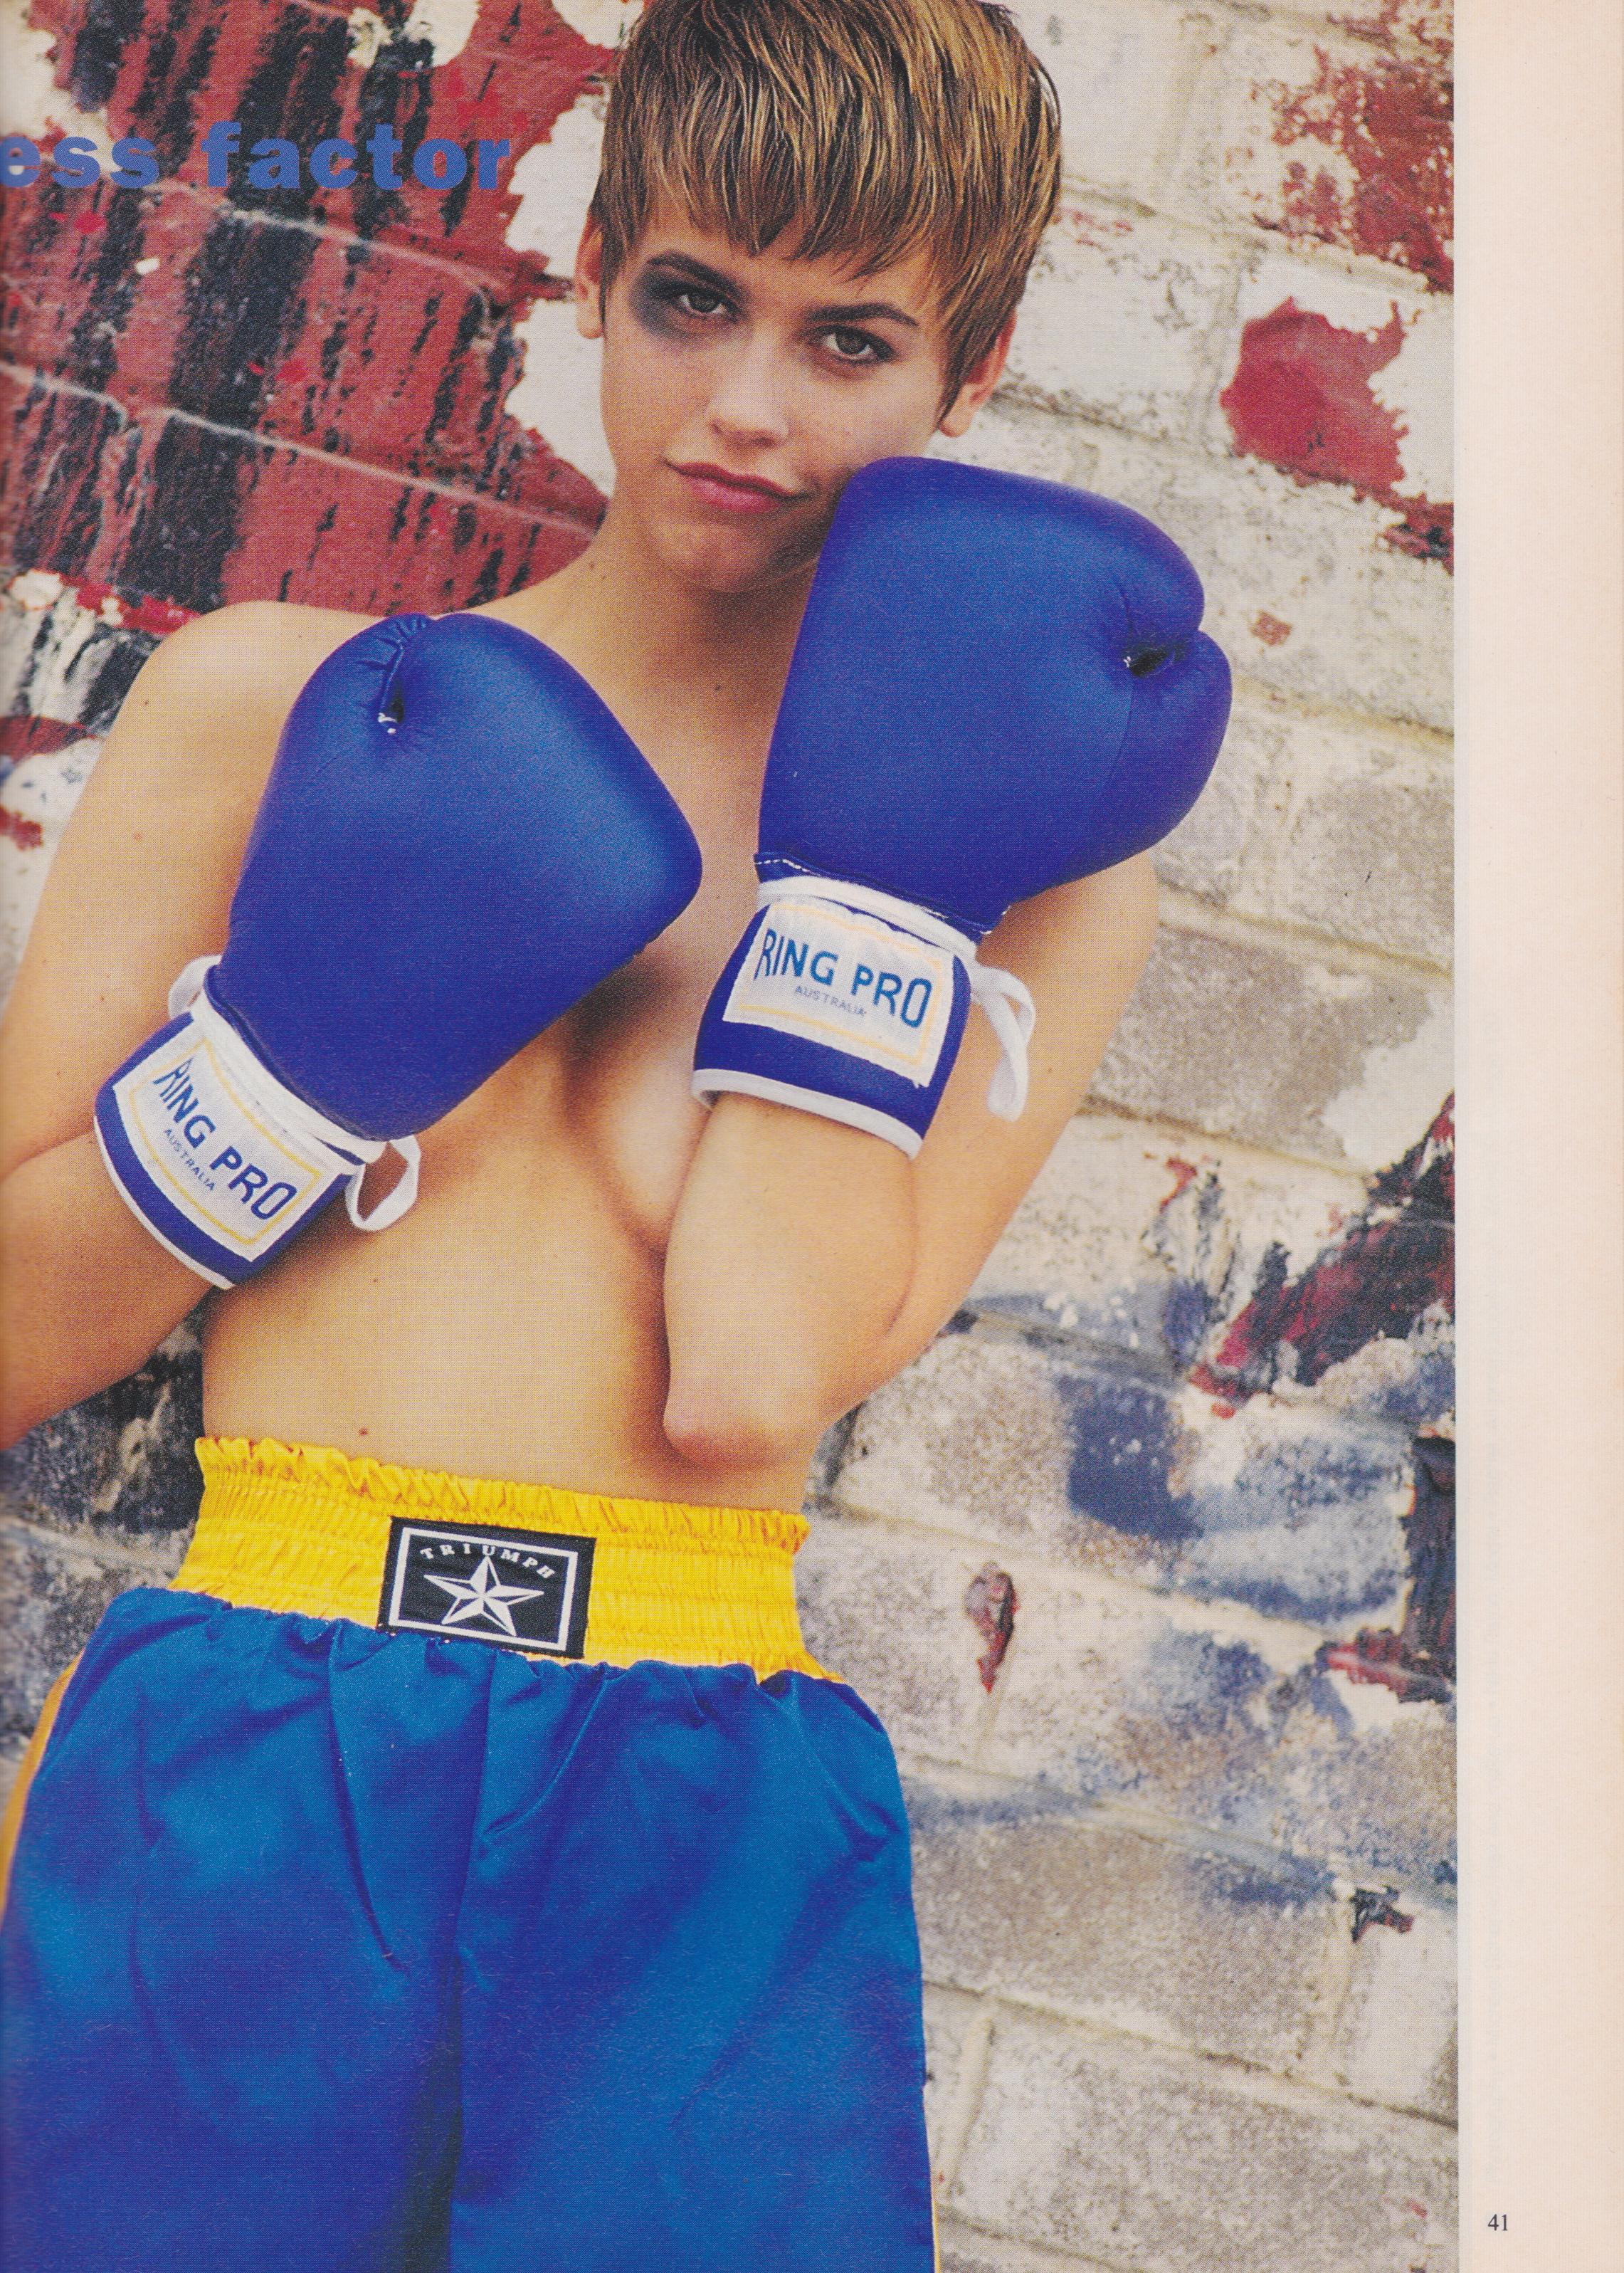 Dolly January 1991 | Rachel Cyriacs | Hyper Active 06.jpeg